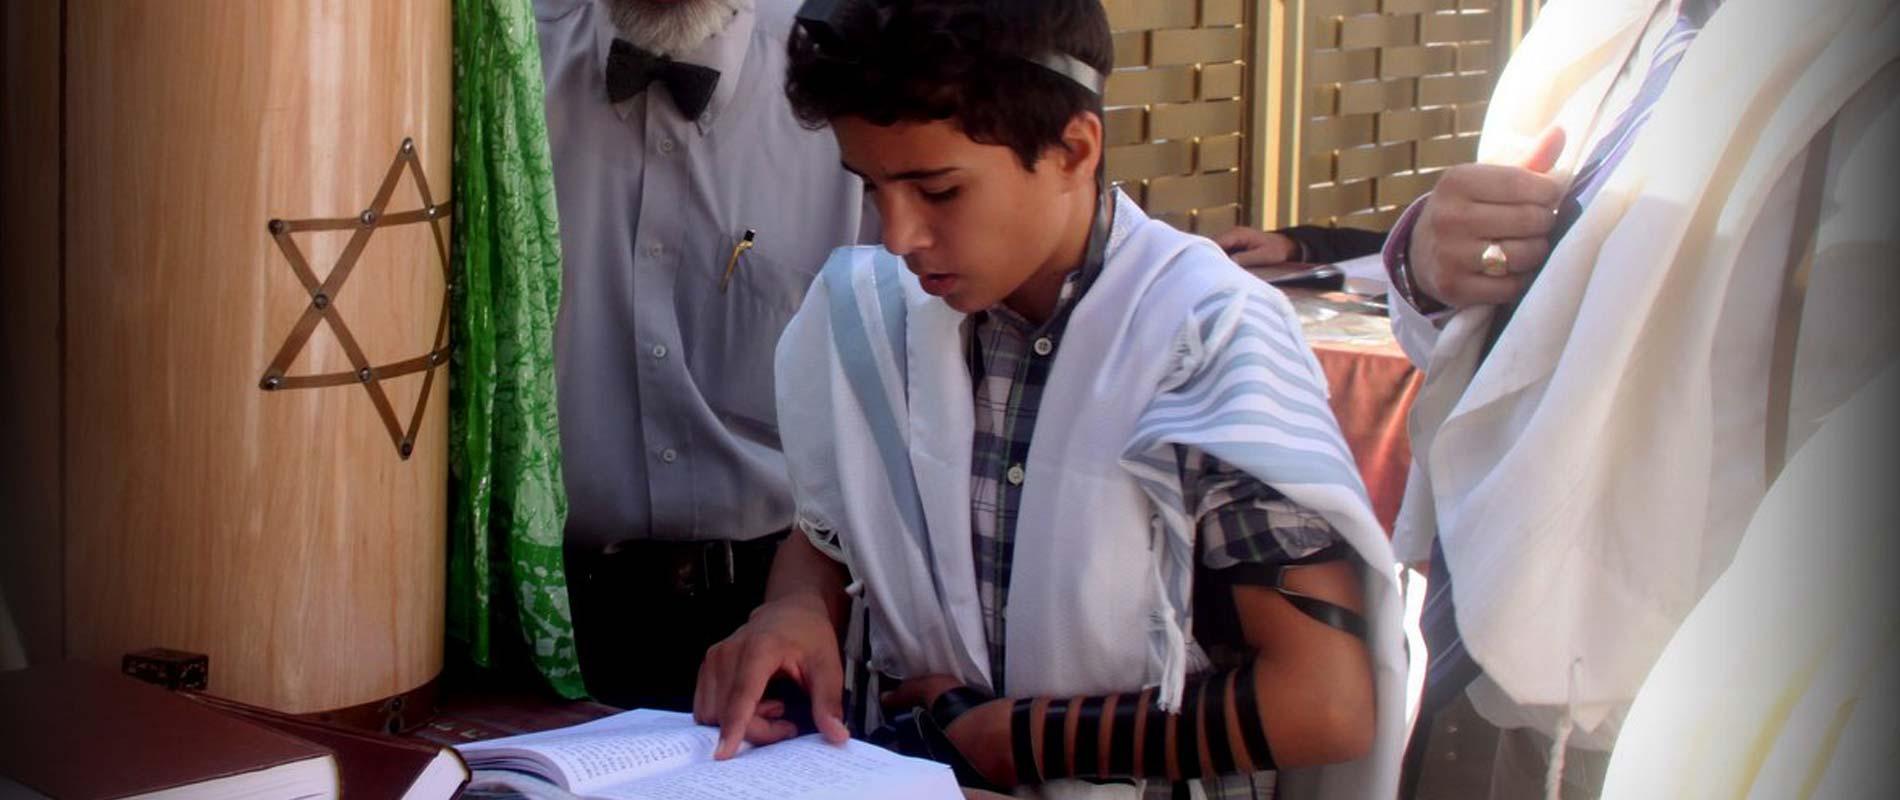 S.T.A.R. Bnei Mitzvah Haggadah Gift Program